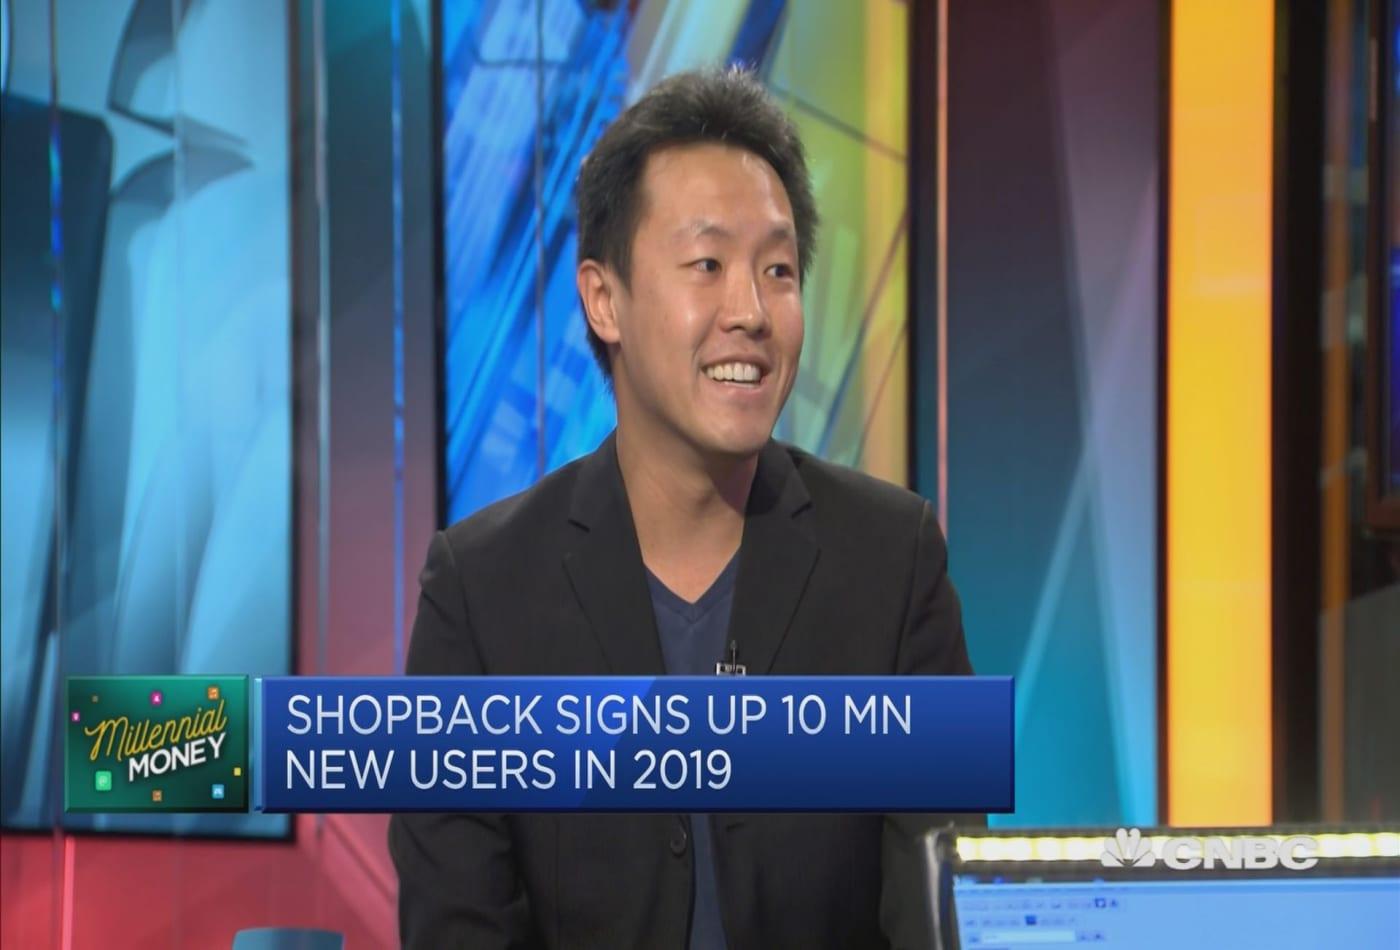 ShopBack: We partner 2,000 merchants to give shoppers cashback